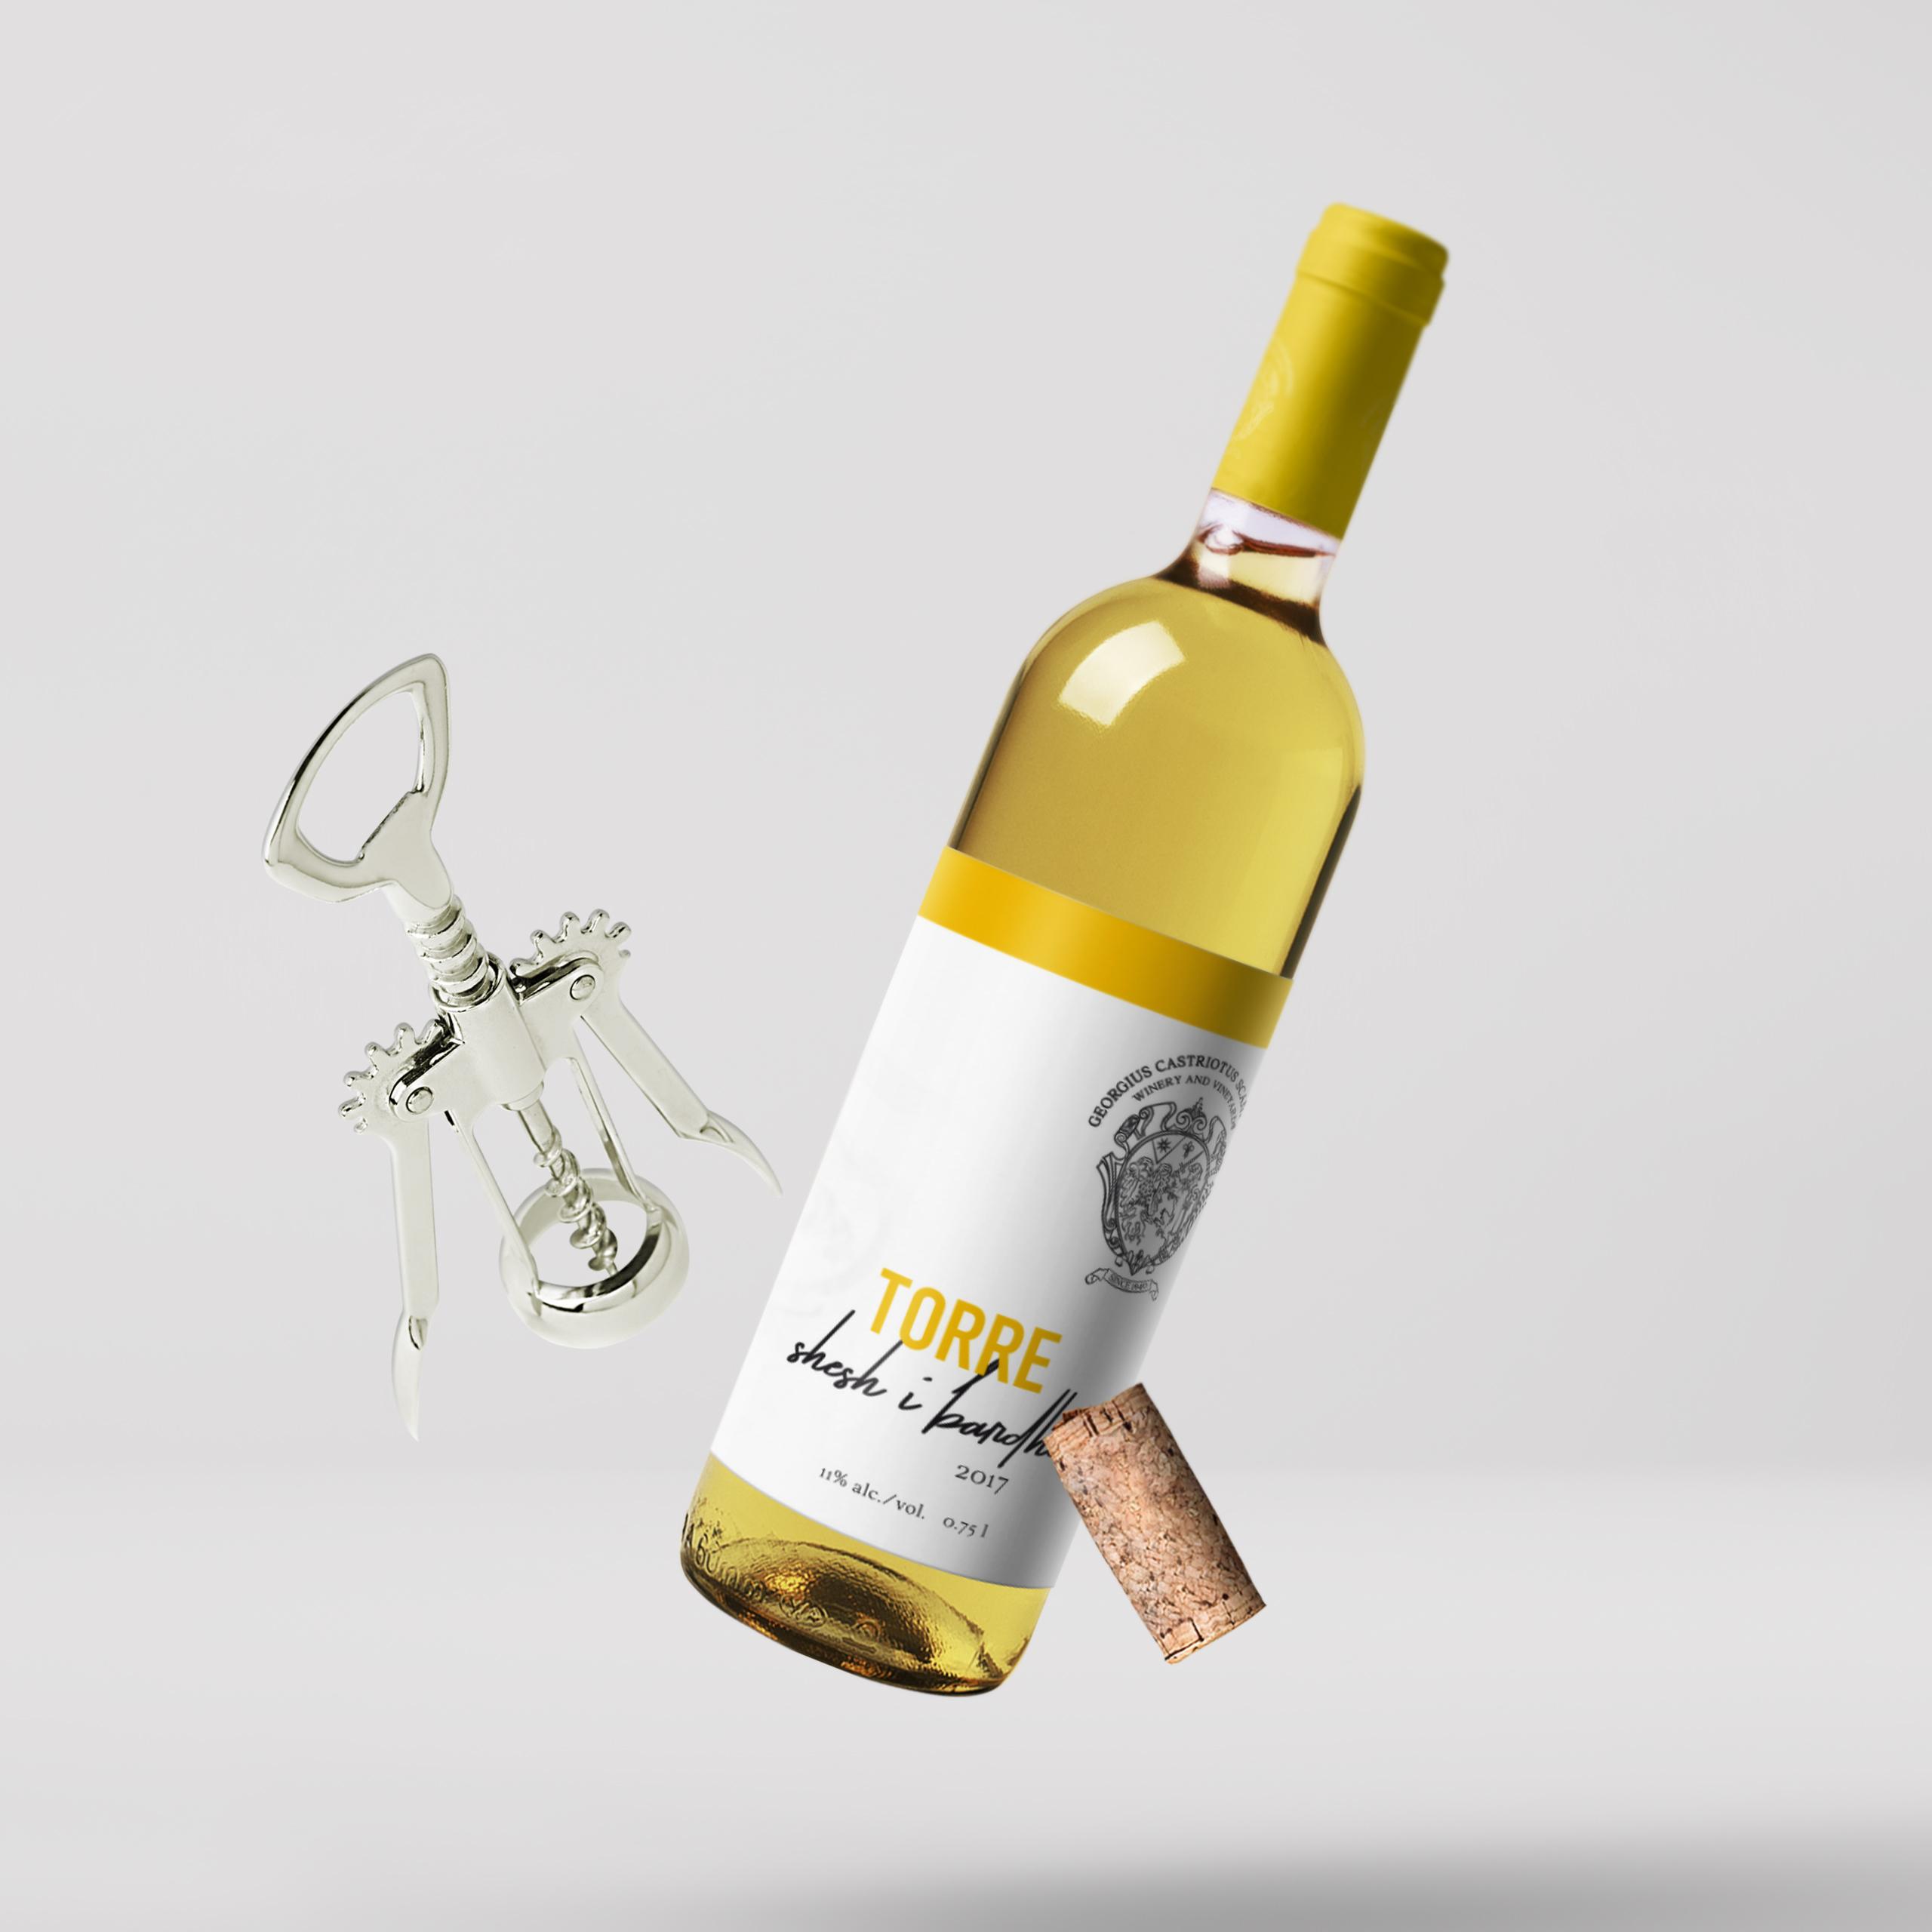 Kantina Skënderbeu, Wine, Project Img 10 - Vatra Agency / Founder & CEO Gerton Bejo